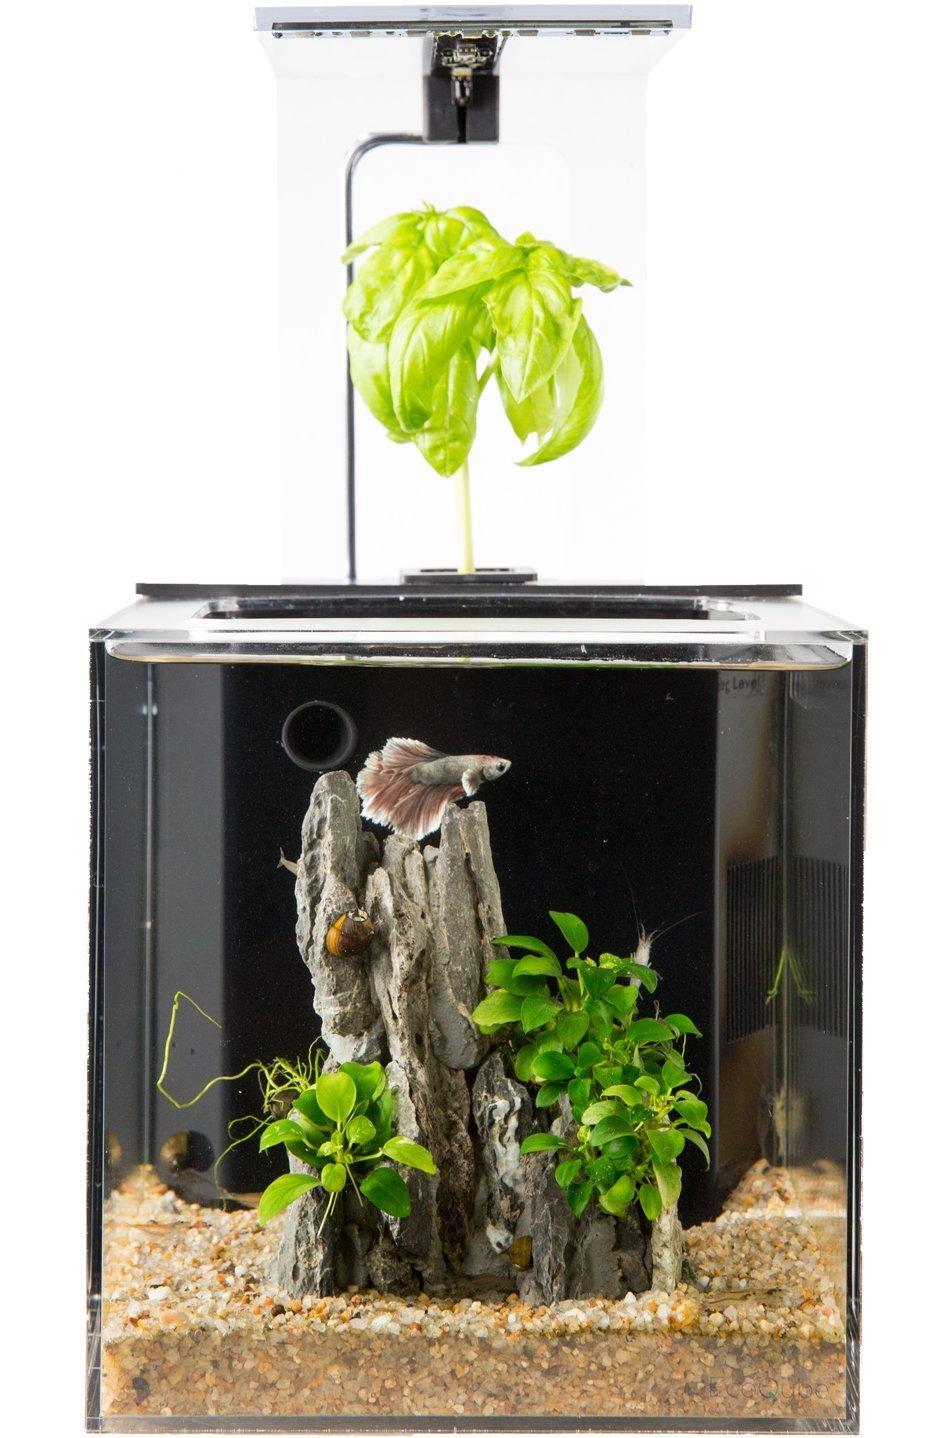 EcoQubeC Aquarium - Desktop Betta Fish Tank For Living Office And Home Décor by EcoQube